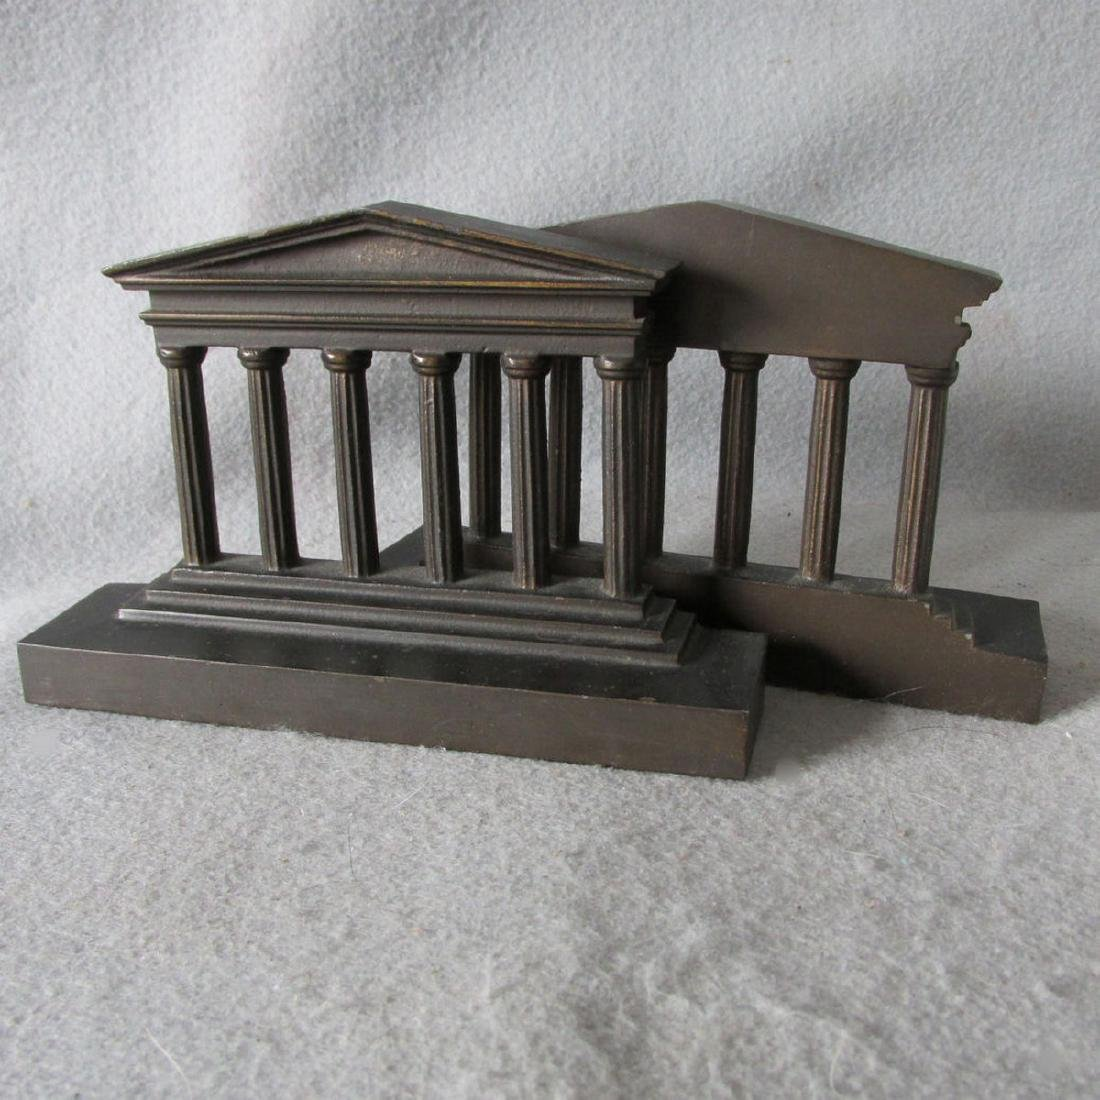 Antique Architectural Column Cast Iron Bookends